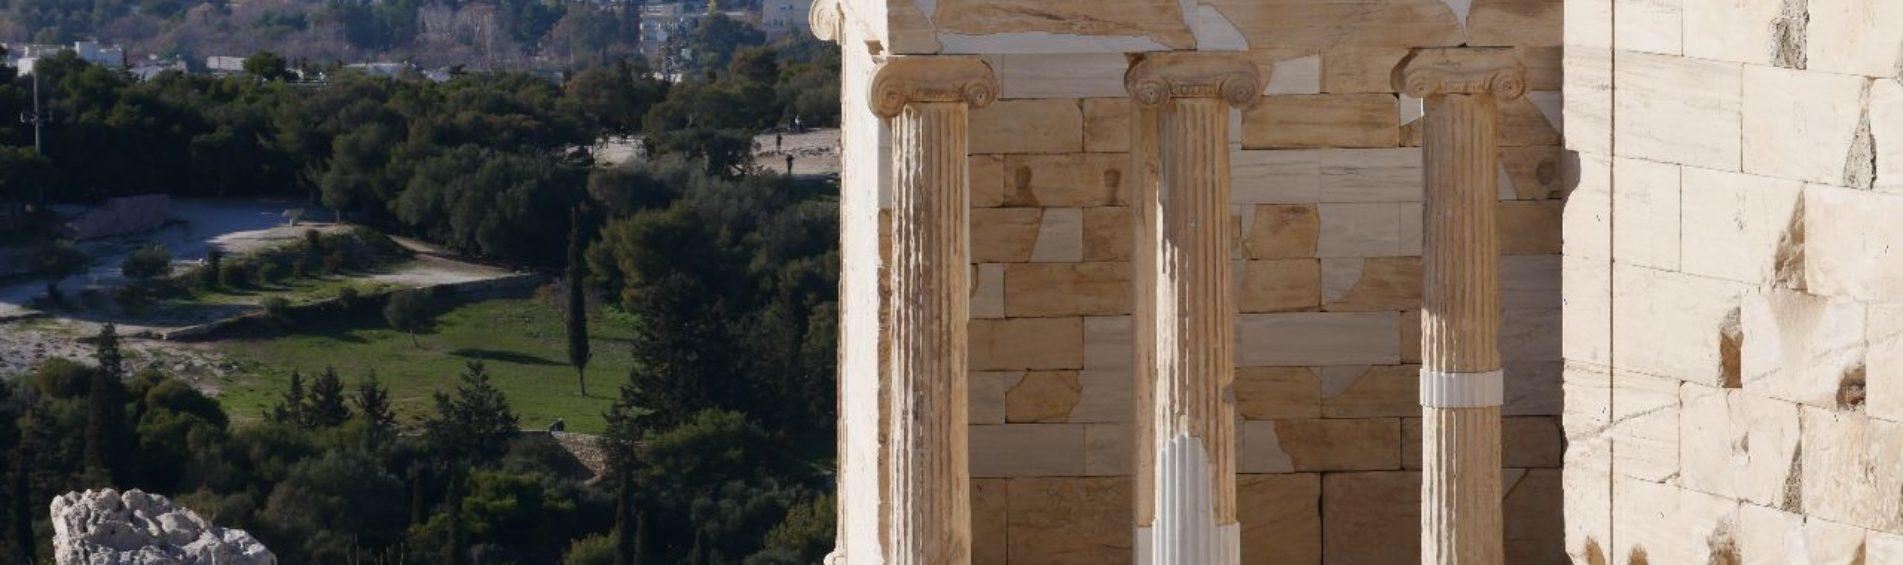 Een stedentrip Athene, wat kost dat?